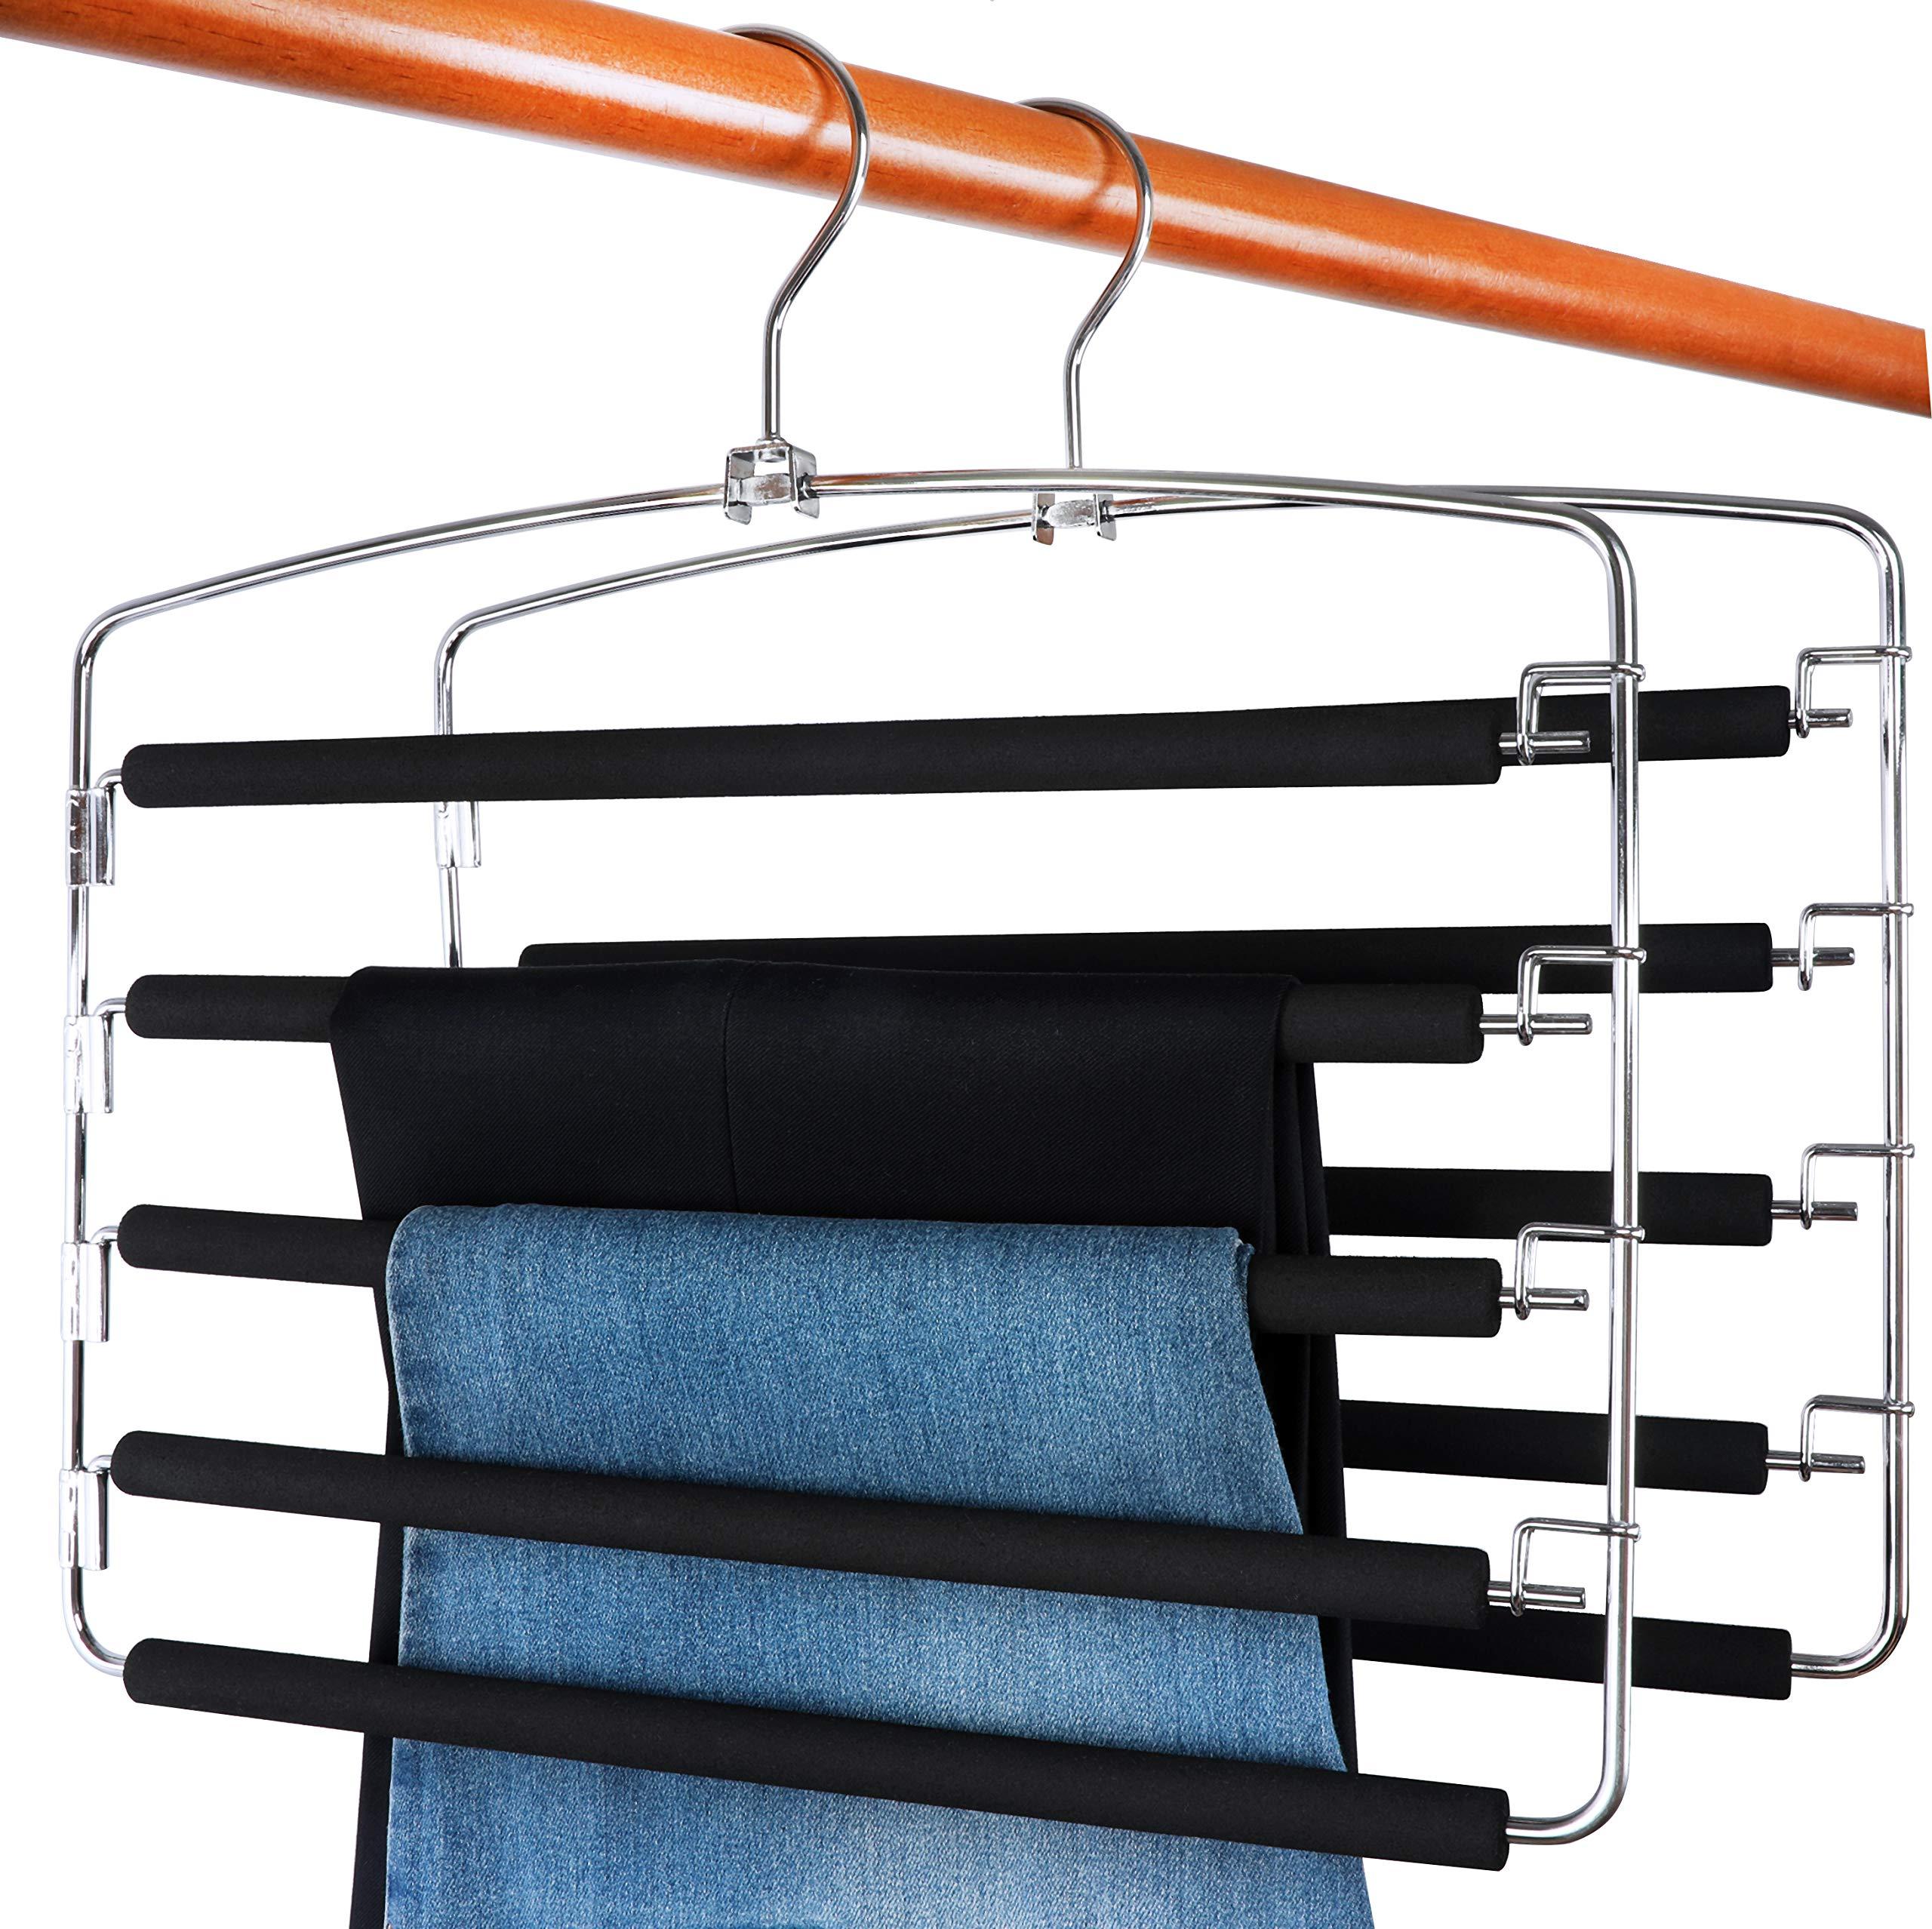 TOPIA HANGER Pants Hangers Slacks Hangers 2 Pack, Swing Arm Slack Hanger, Space Saving Non-Slip Foam Padded Closet Storage Organizer for Pants Jeans Trousers Skirts Scarf CT08B